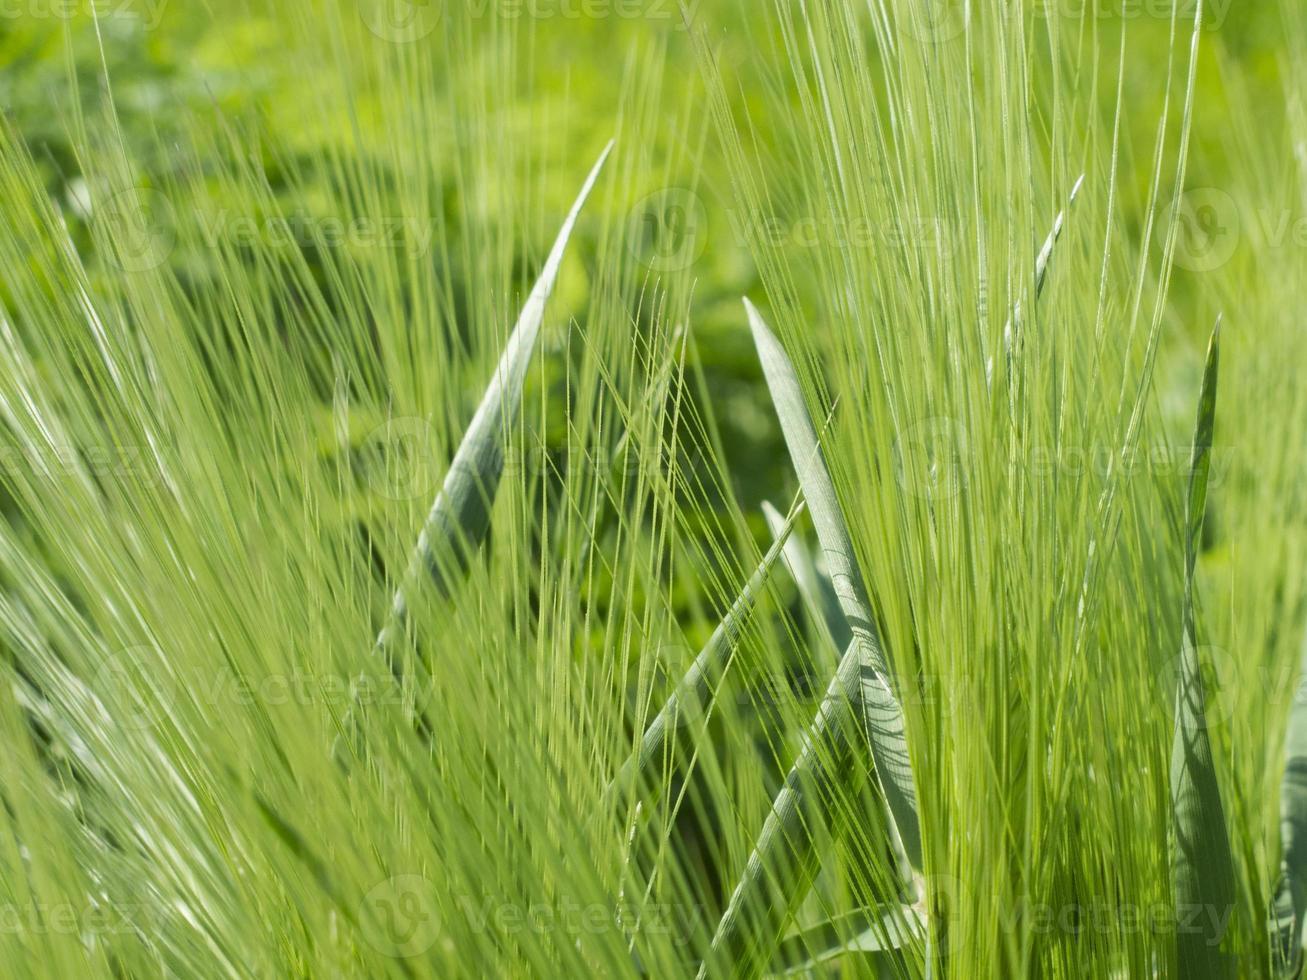 fili d'erba foto